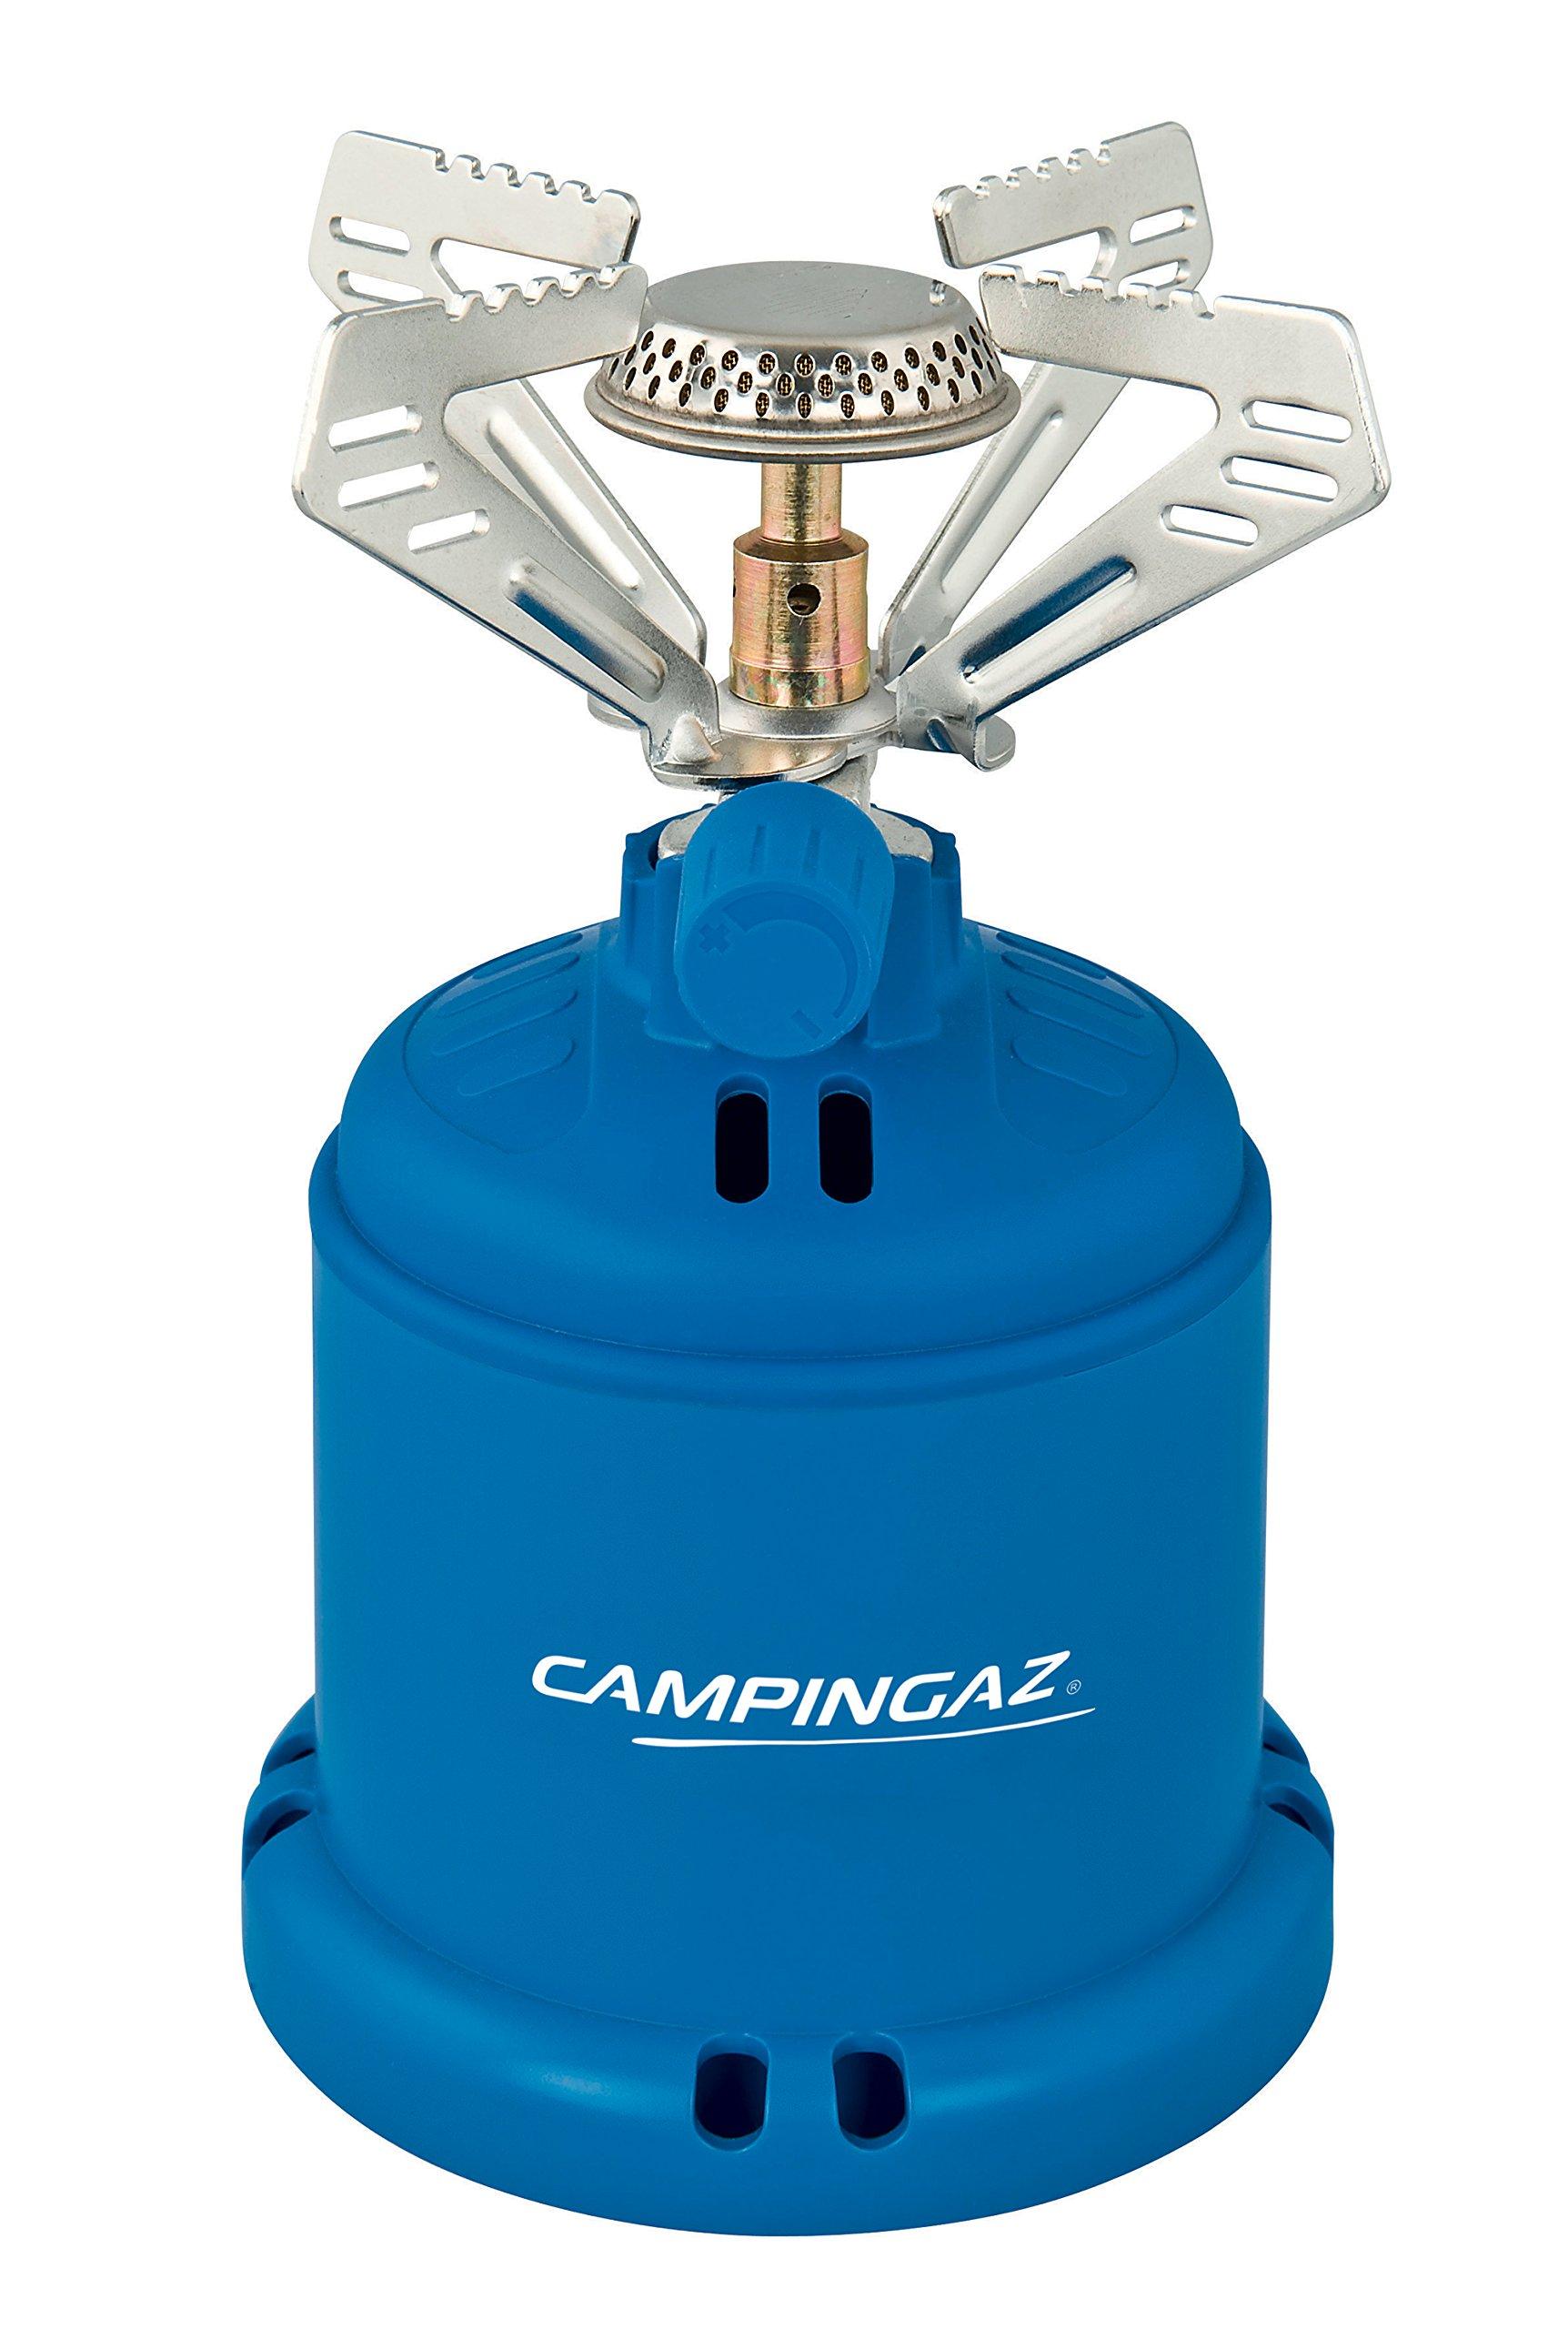 81g%2BFvfwM9L - Campingaz Camping 206 Stove